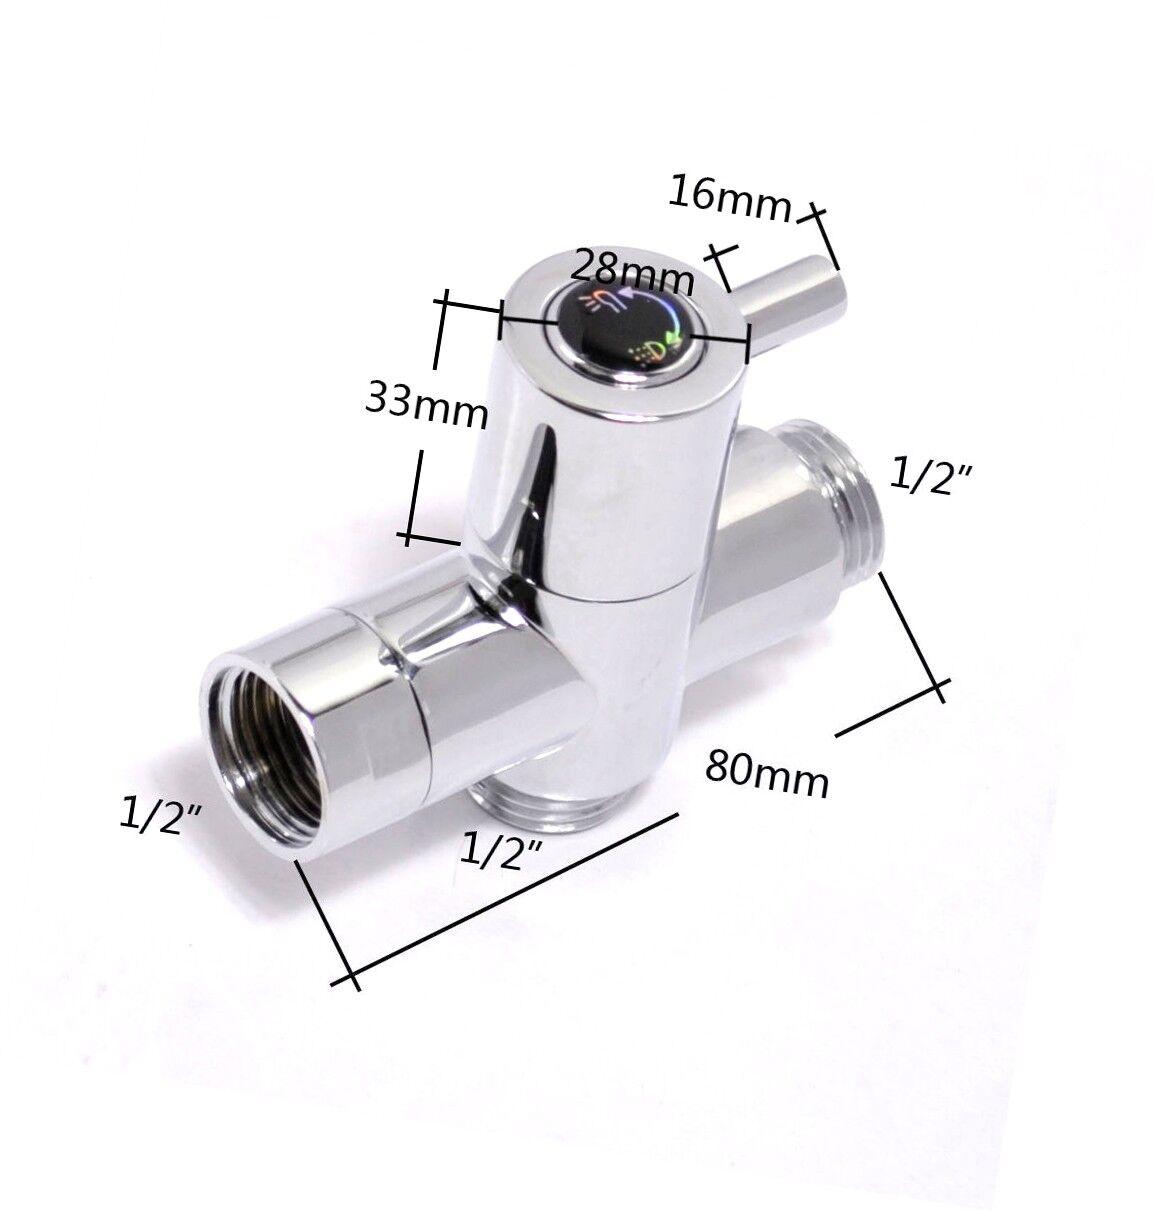 Details About 3 Ways T Adapter Valve Diverter For Handheld Shower Head Or Bidet Sprayer G1 2